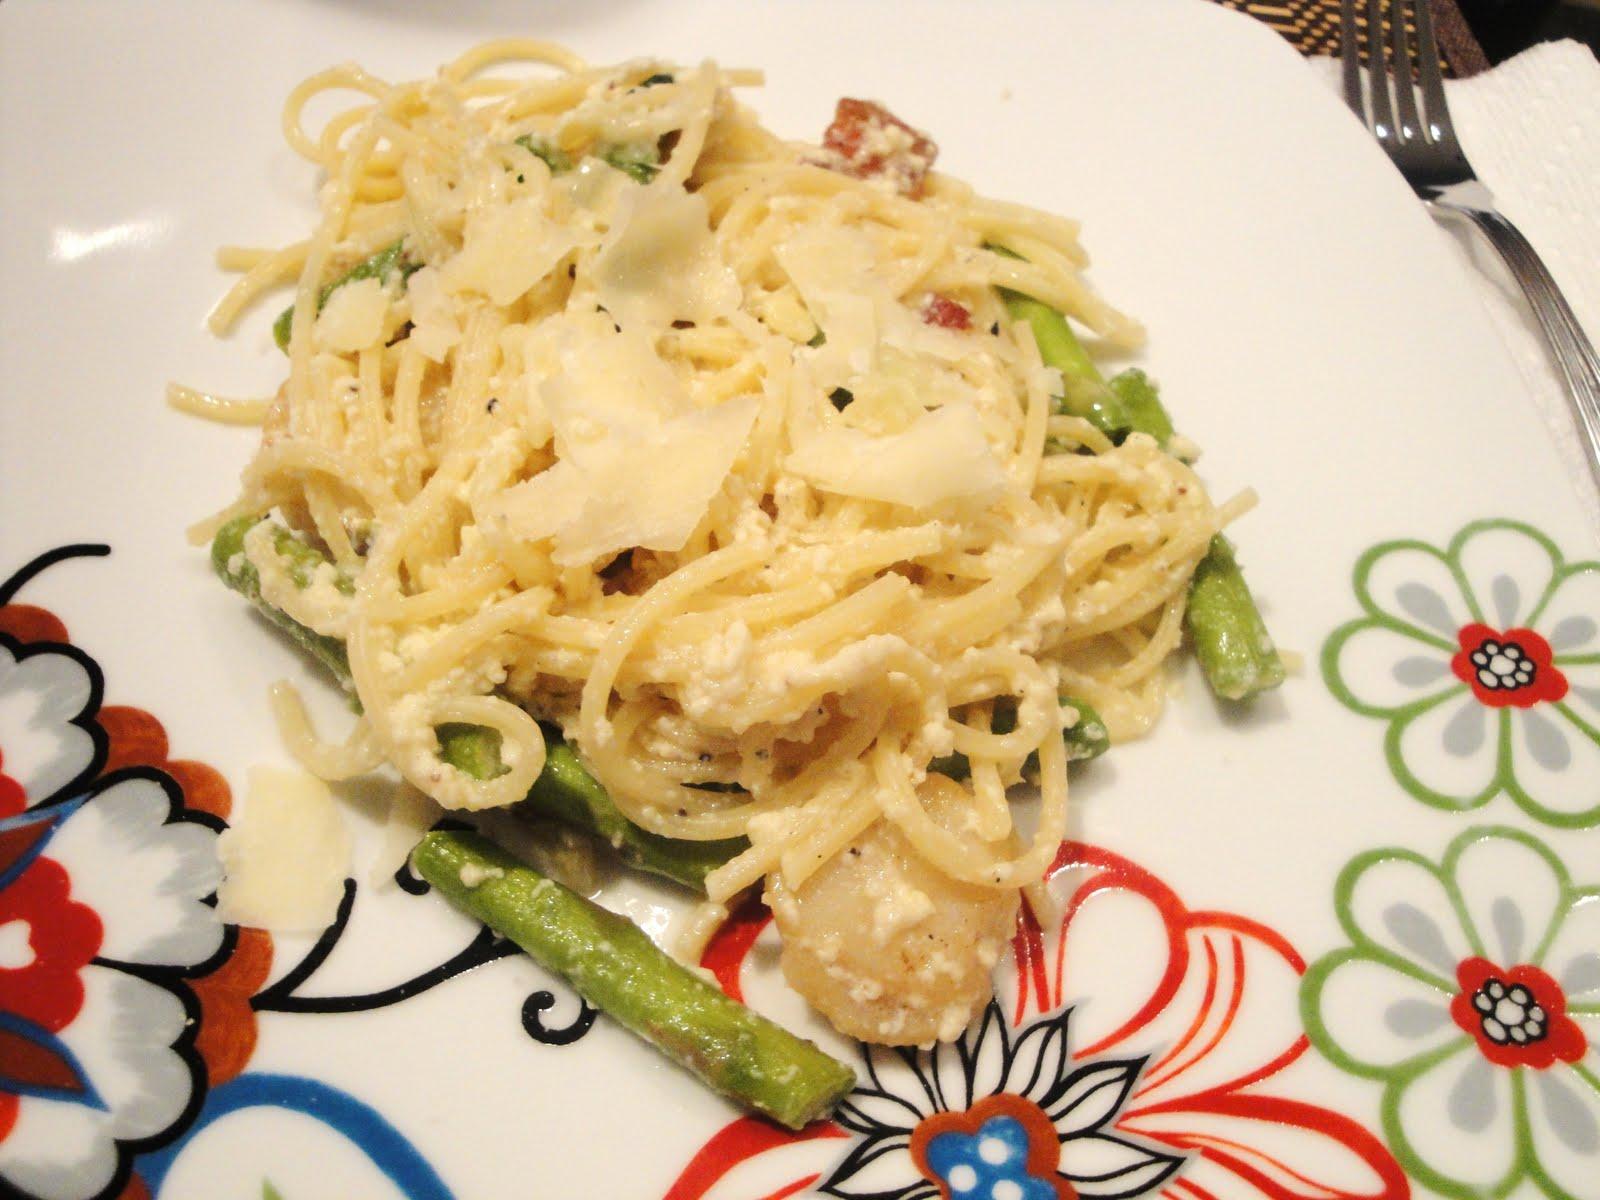 ... , & Life: {recipe} bruschetta, sangria, & asparagus carbonara, oh my